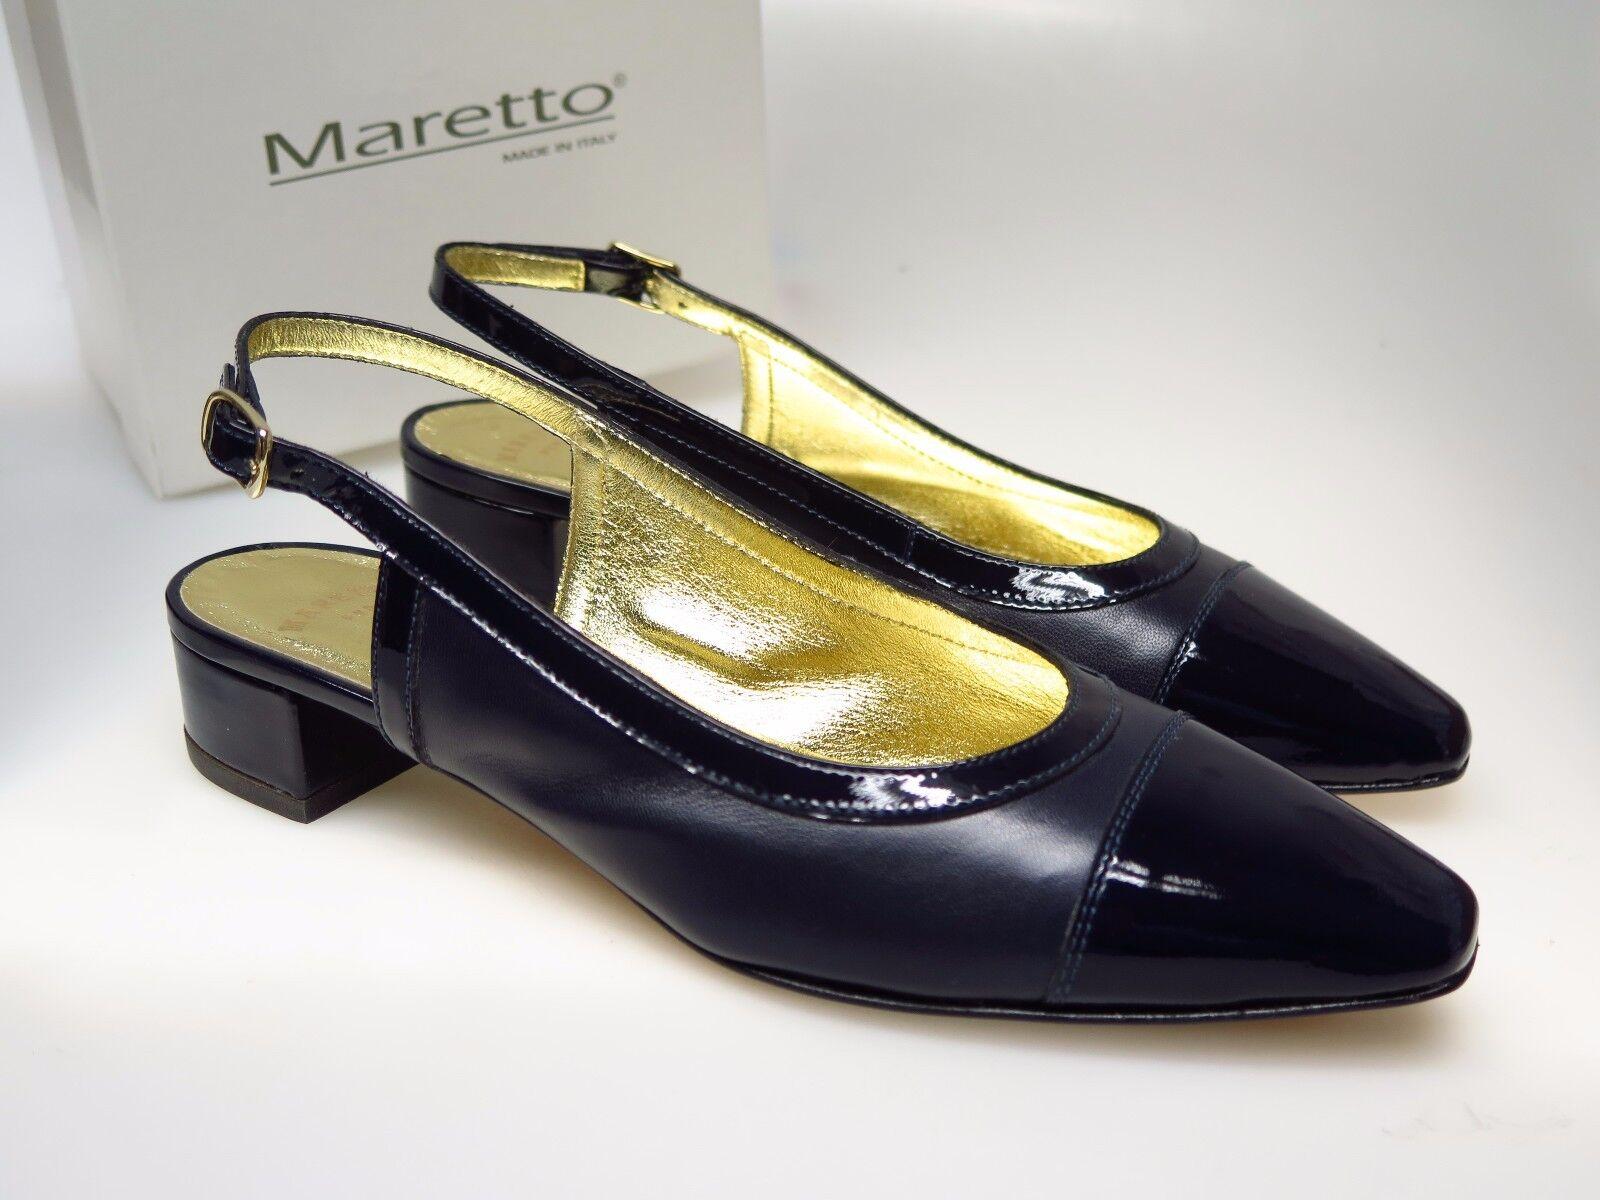 MARETTO Italy Designer Damenschuhe 6955 Gina Nappa Vernice Bleu Gr. 36,5 NEU